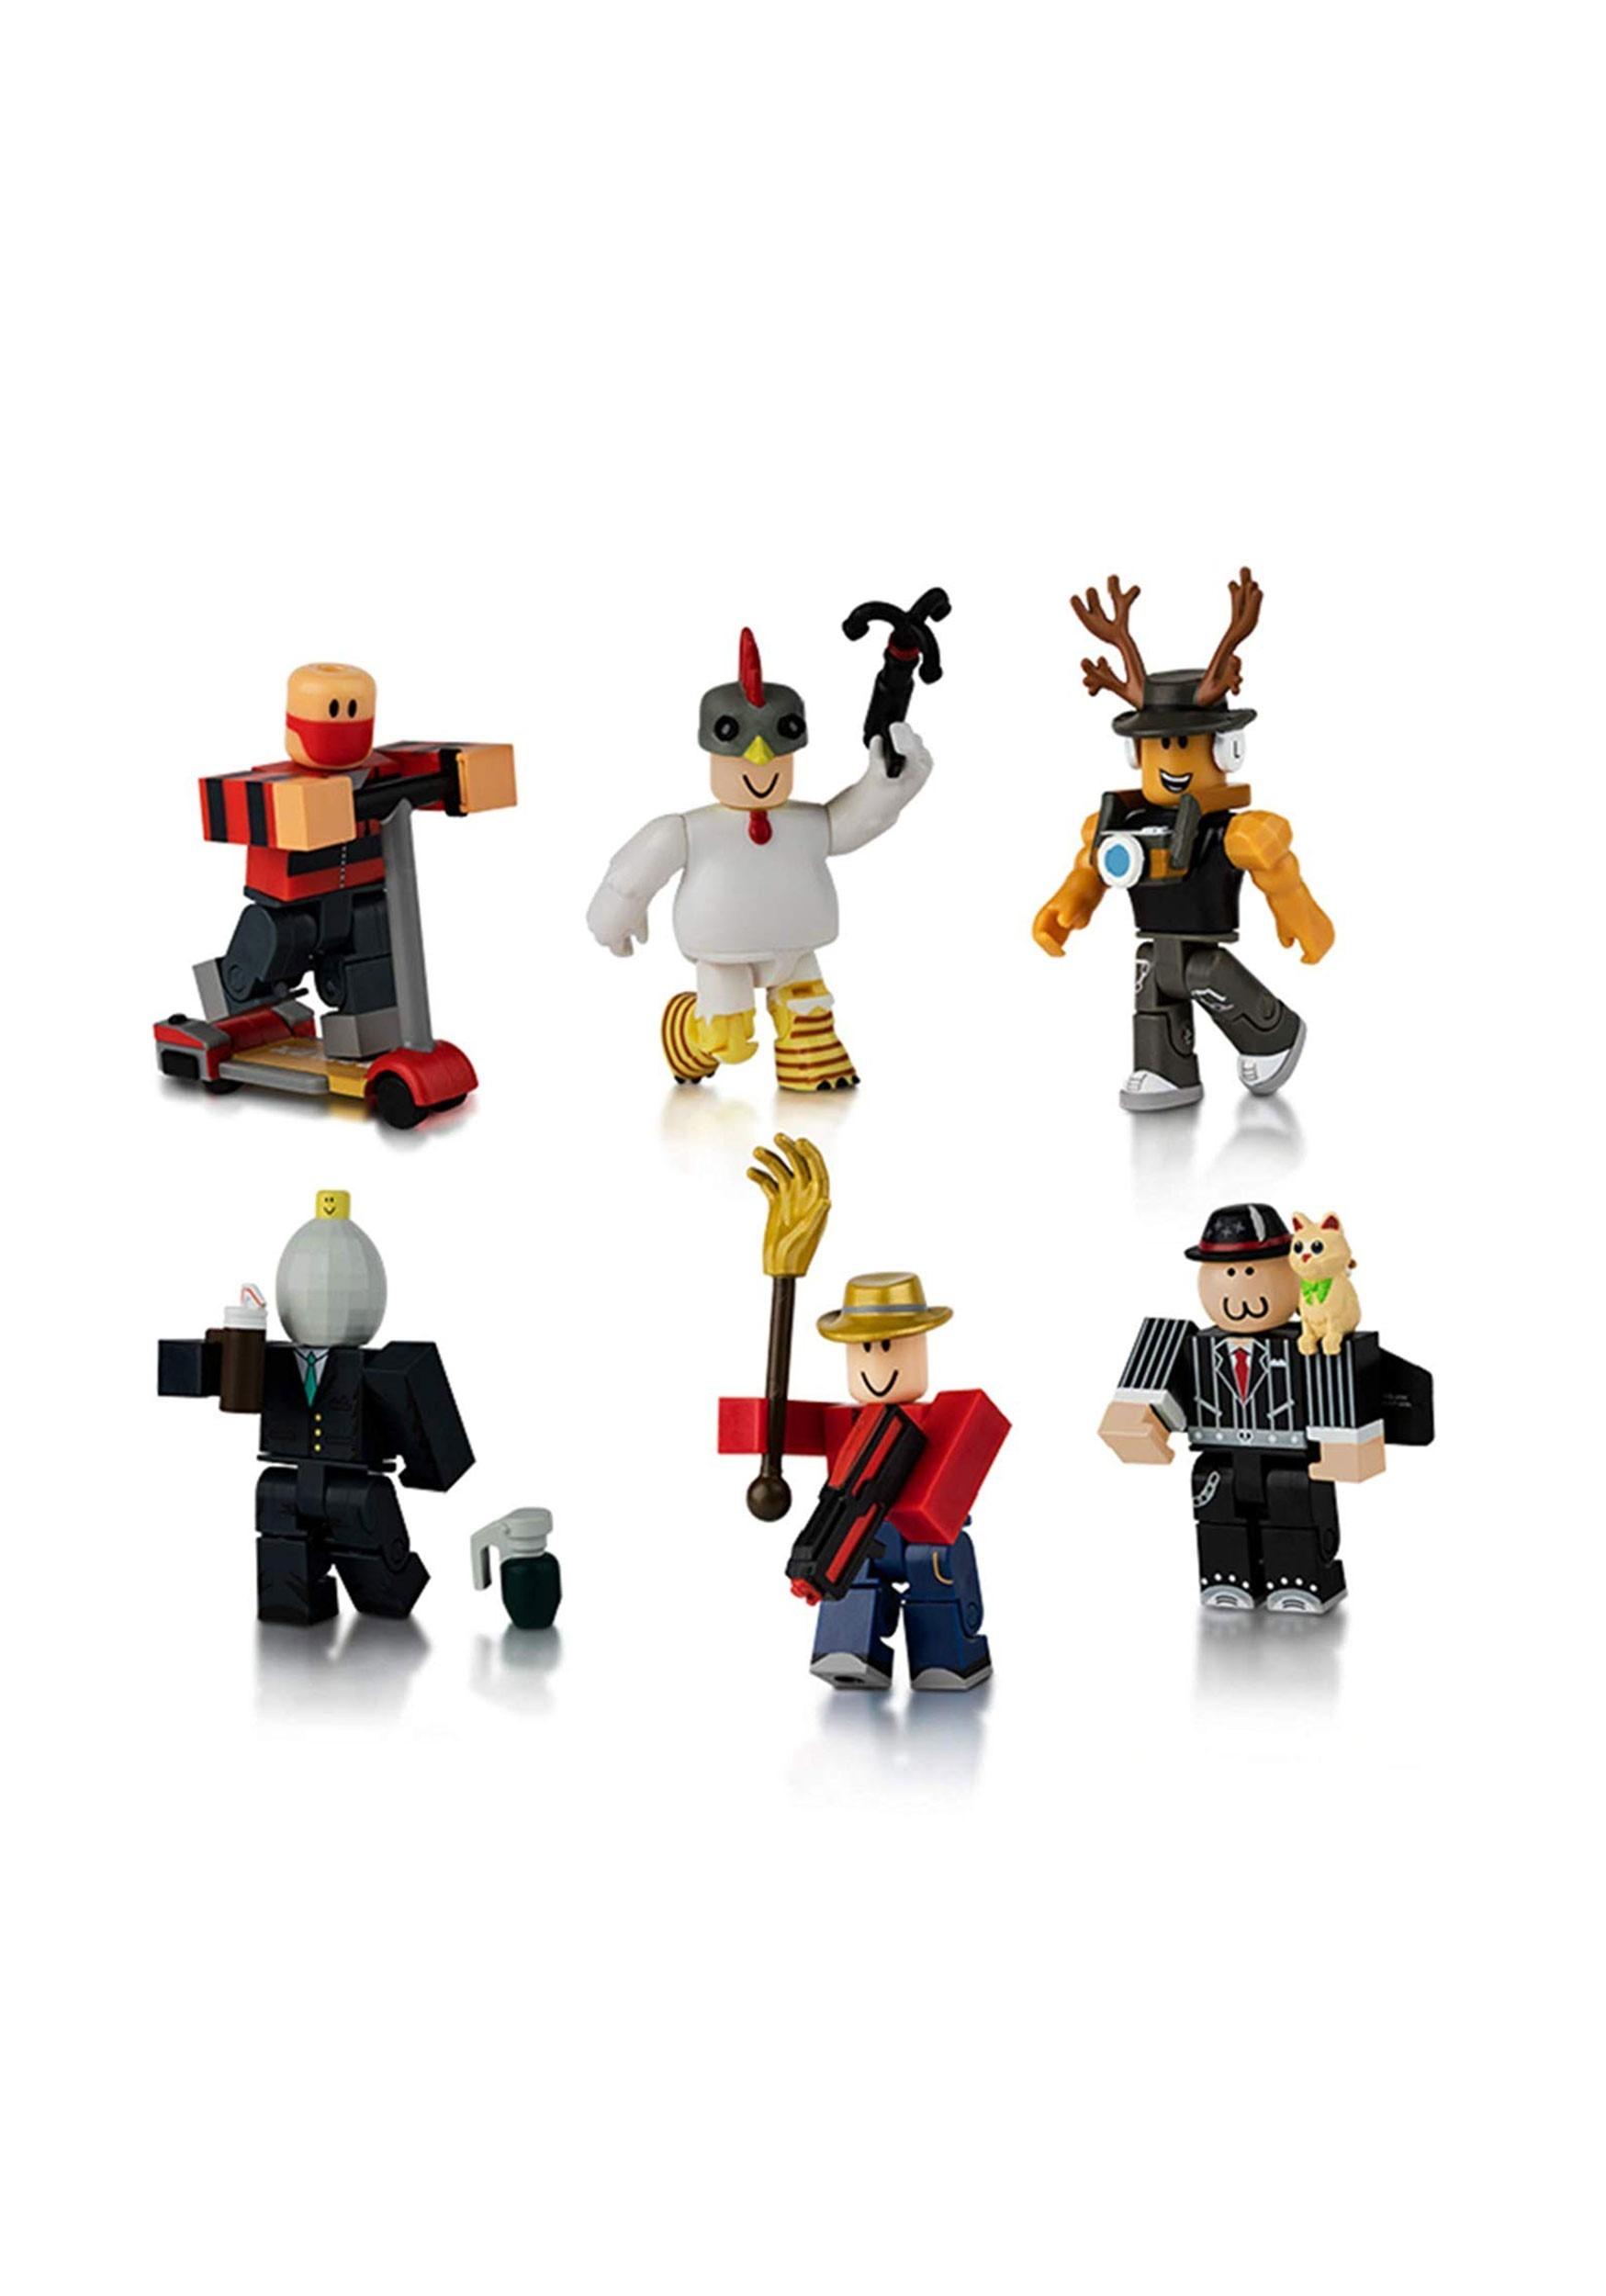 Toy Animation Roblox : animation, roblox, Roblox, Masters